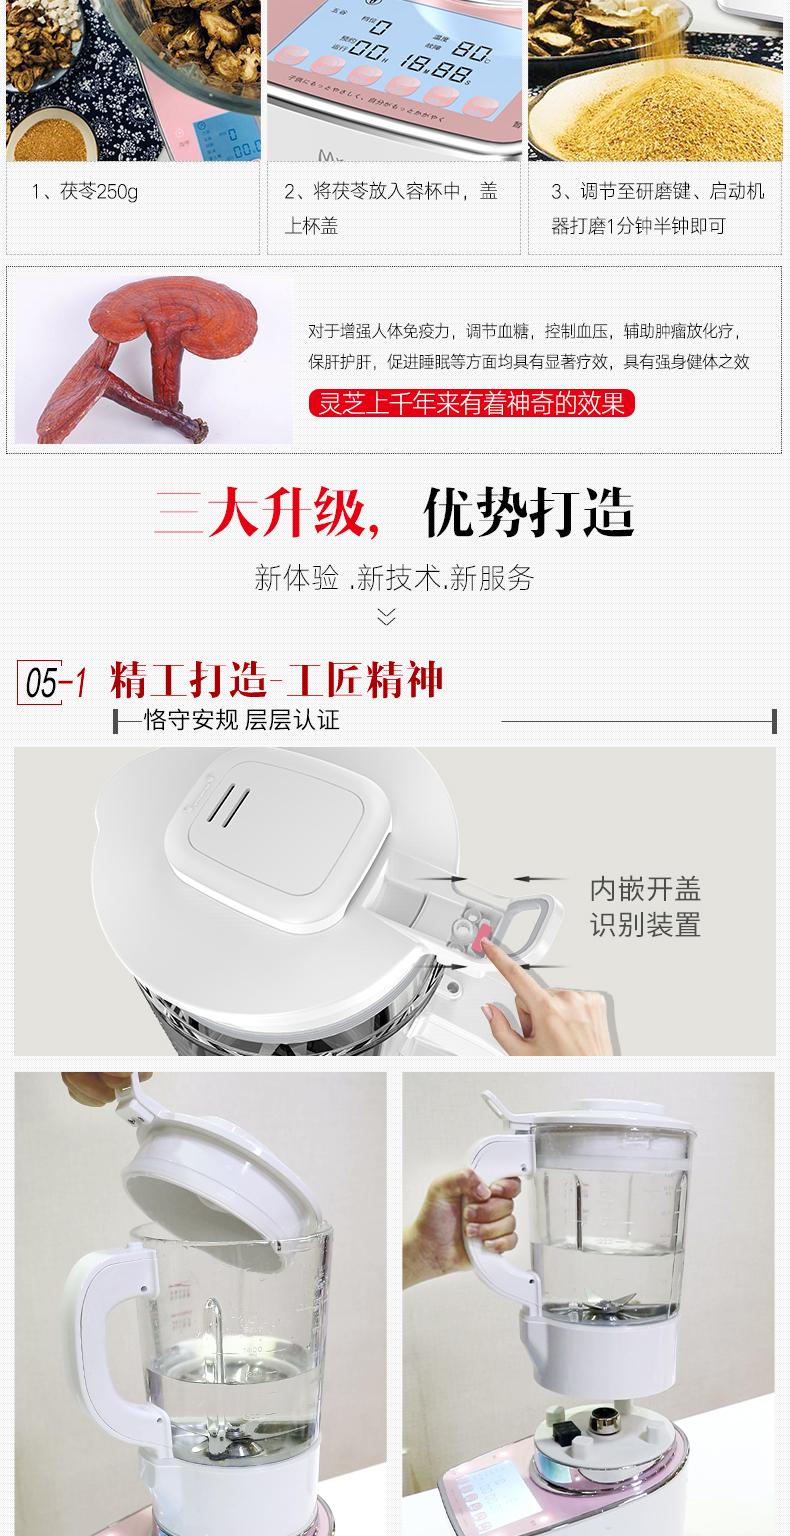 kitchen aid artisan mixer sink spray hose replacement 超級媽咪s1加熱破壁料理機養生豆漿全自動家用多功能輔食攪拌機 商品詳情